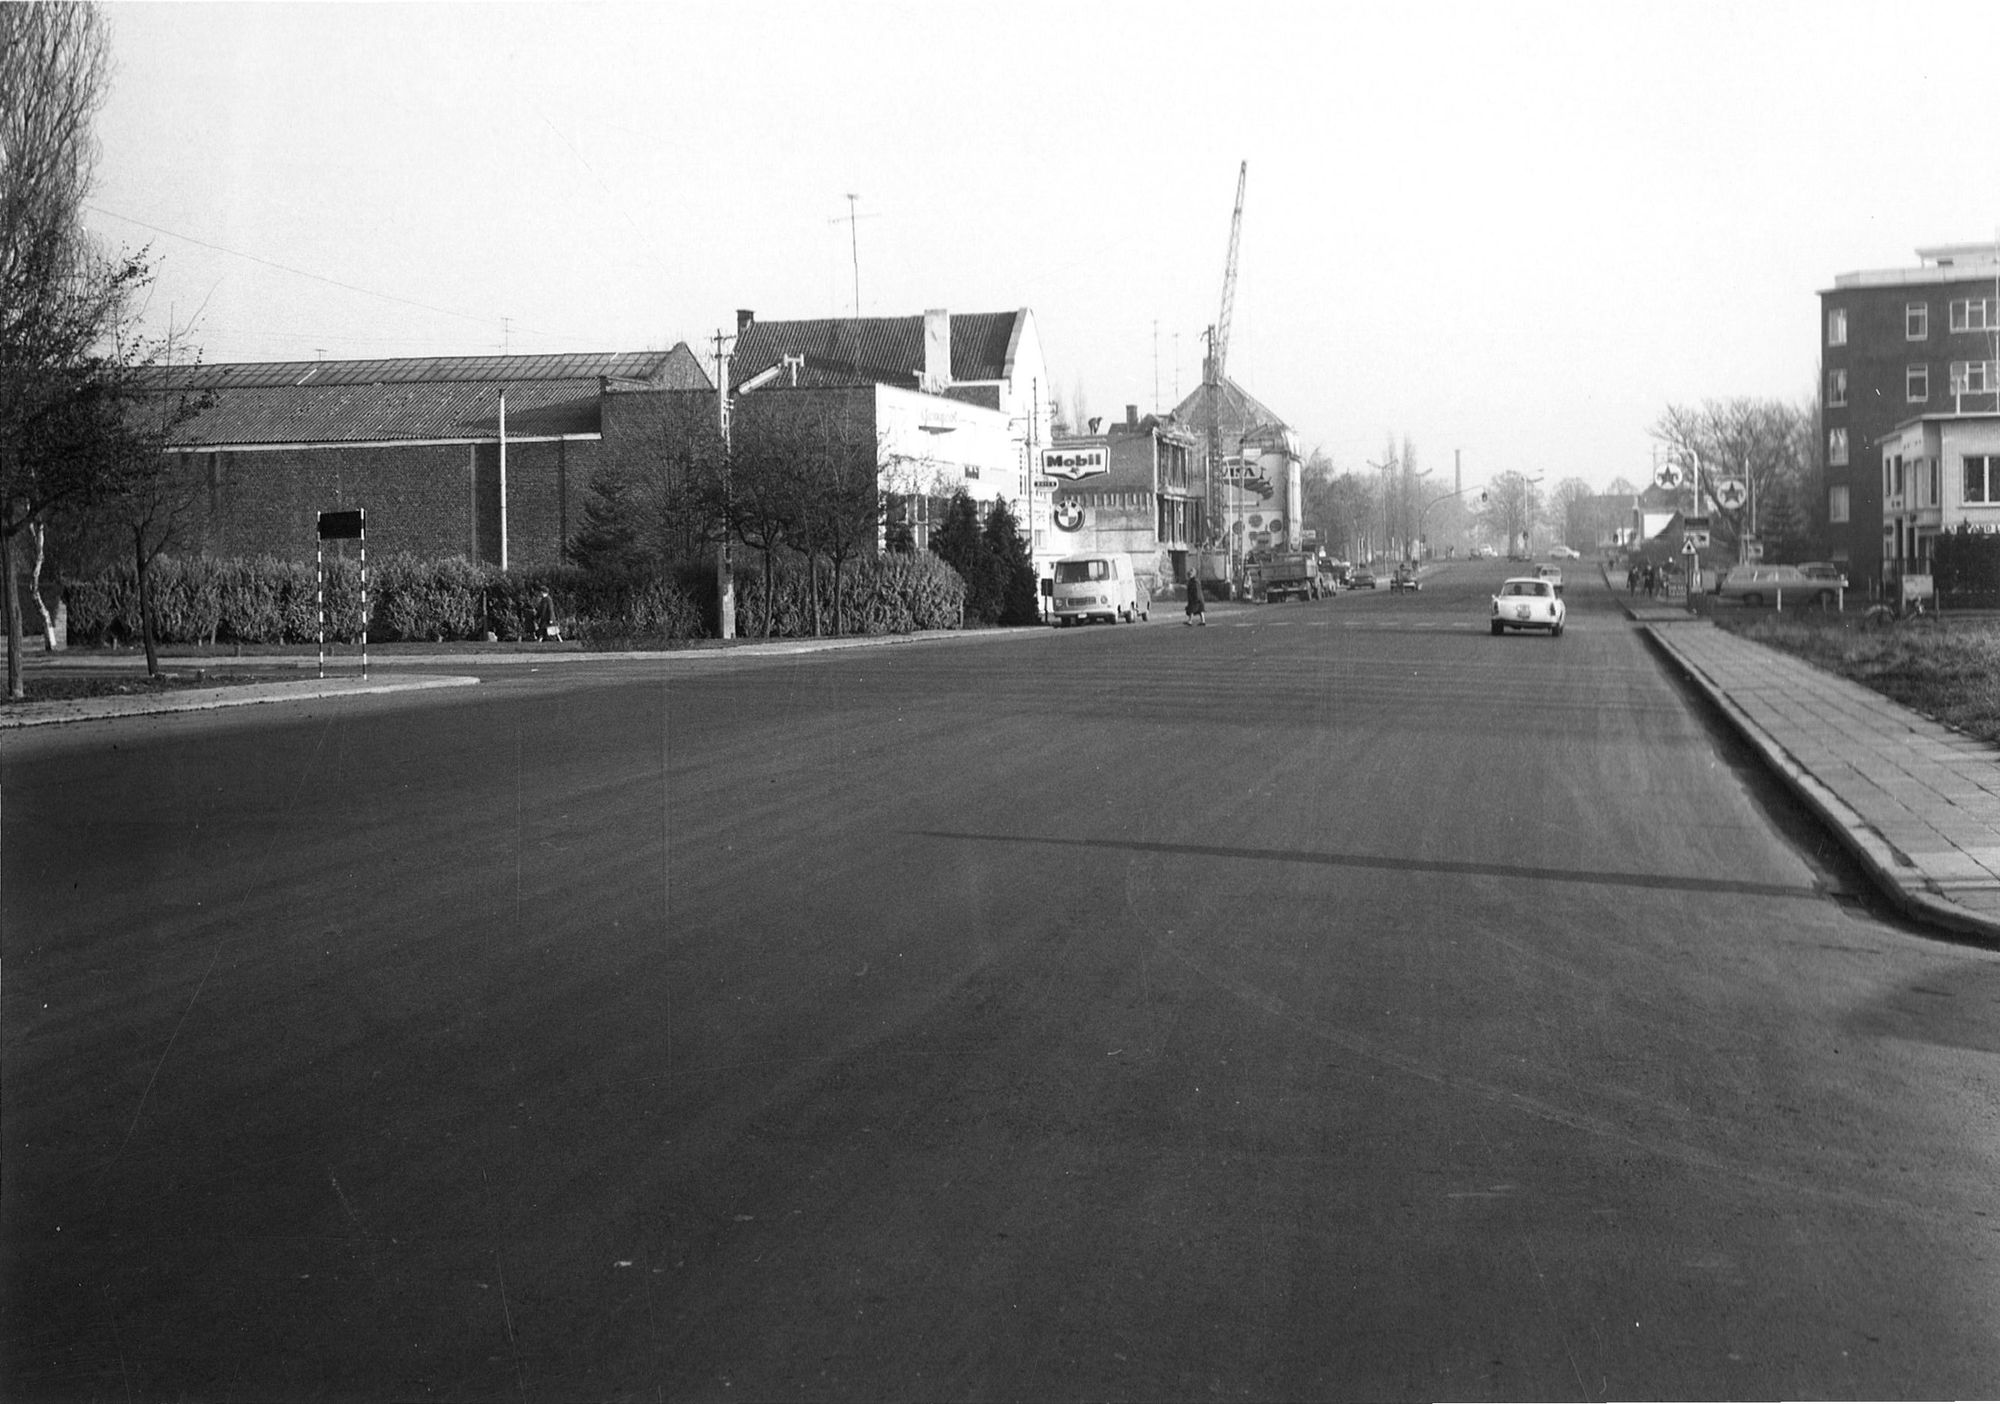 Burgemeester Vercruysselaan 1968